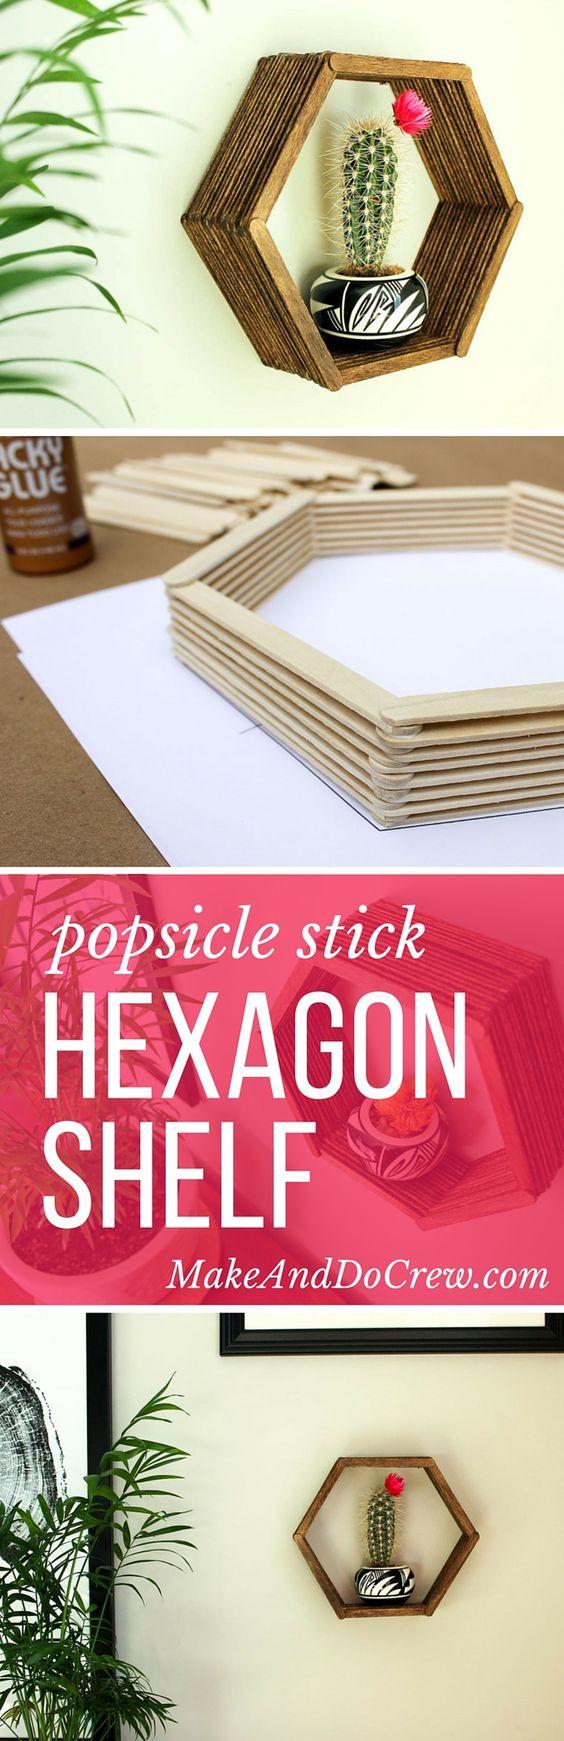 Easy Popsicle Stick Hexagon Shelf.